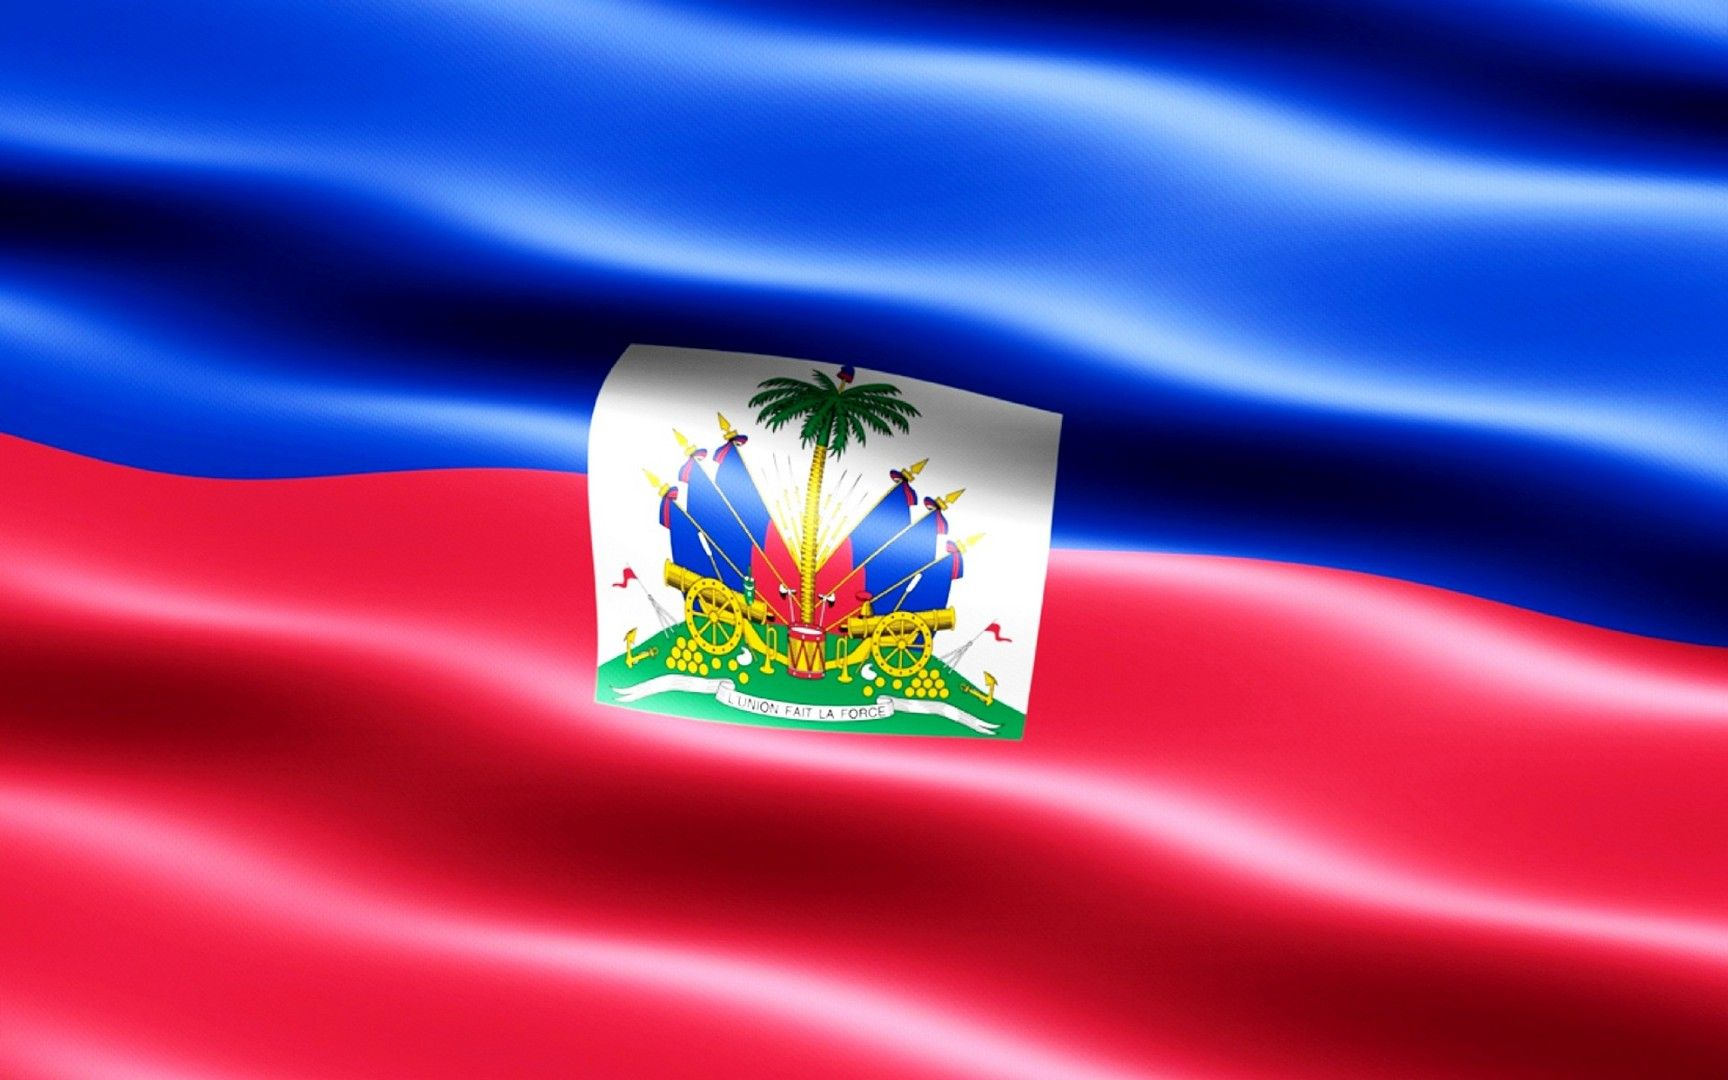 Haitian Flag Wallpaper Hd   1728x1080   Download HD Wallpaper 1728x1080